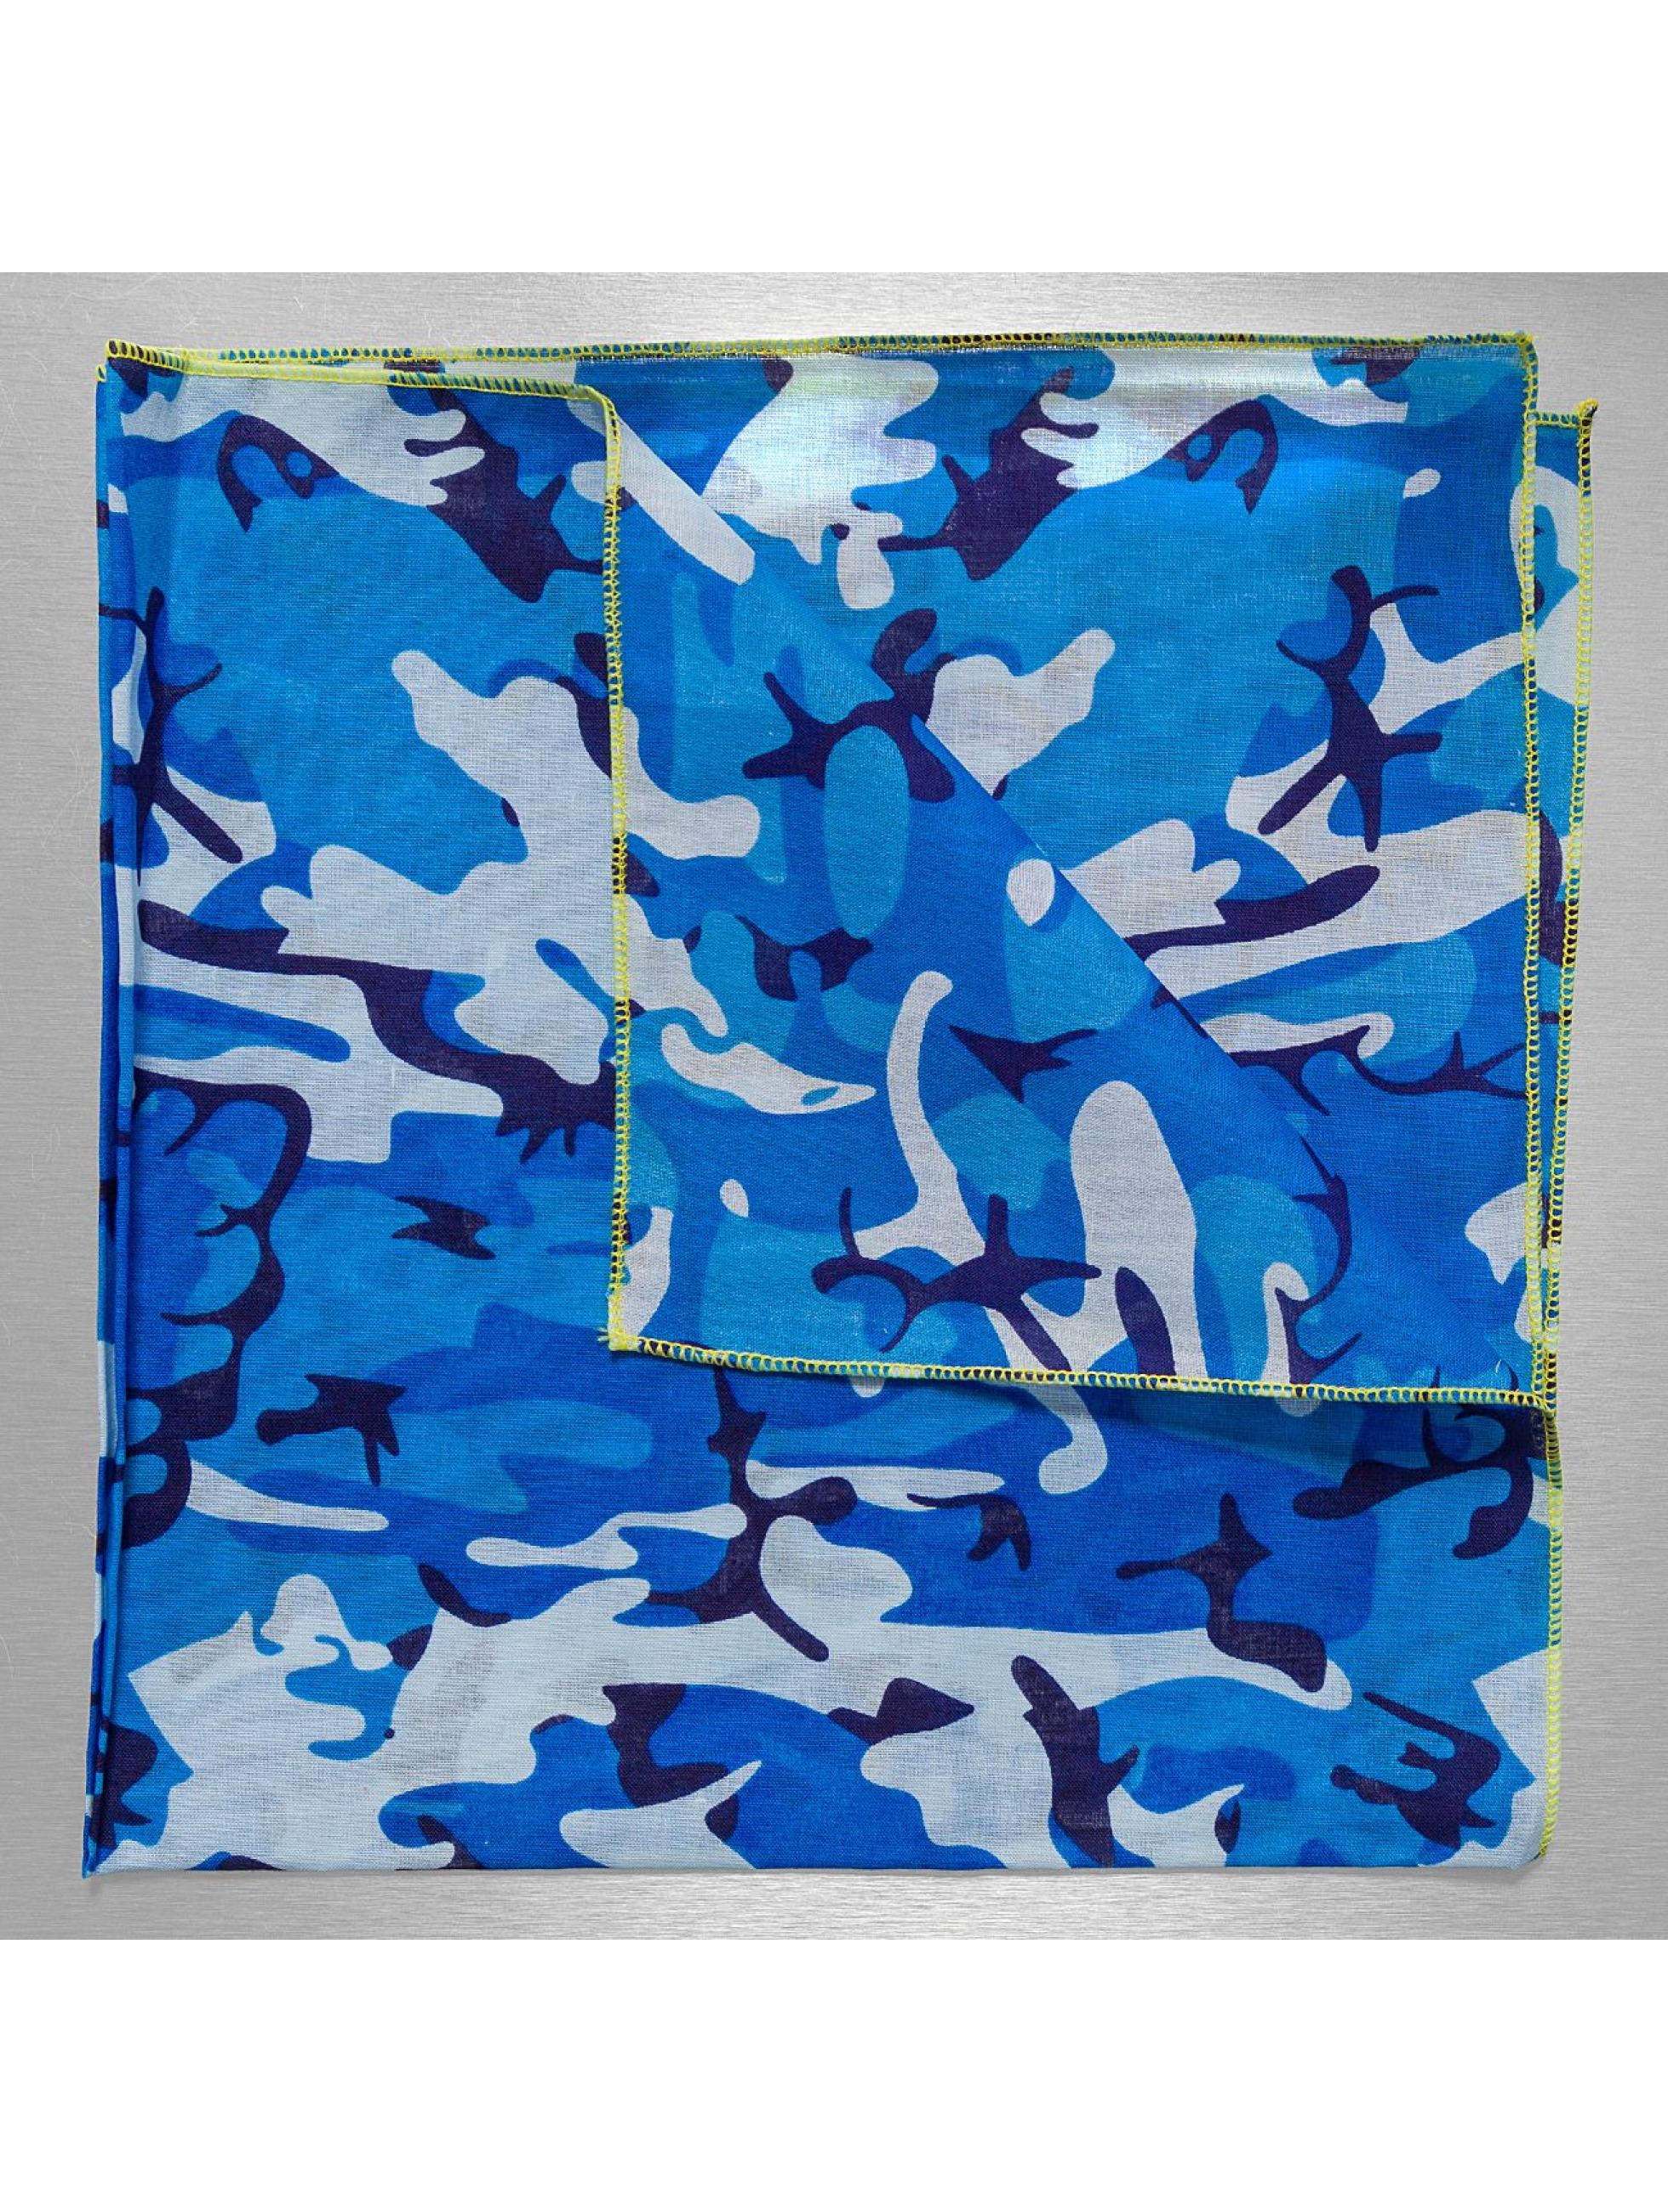 MSTRDS Männer,Frauen Bandana Special Print in blau